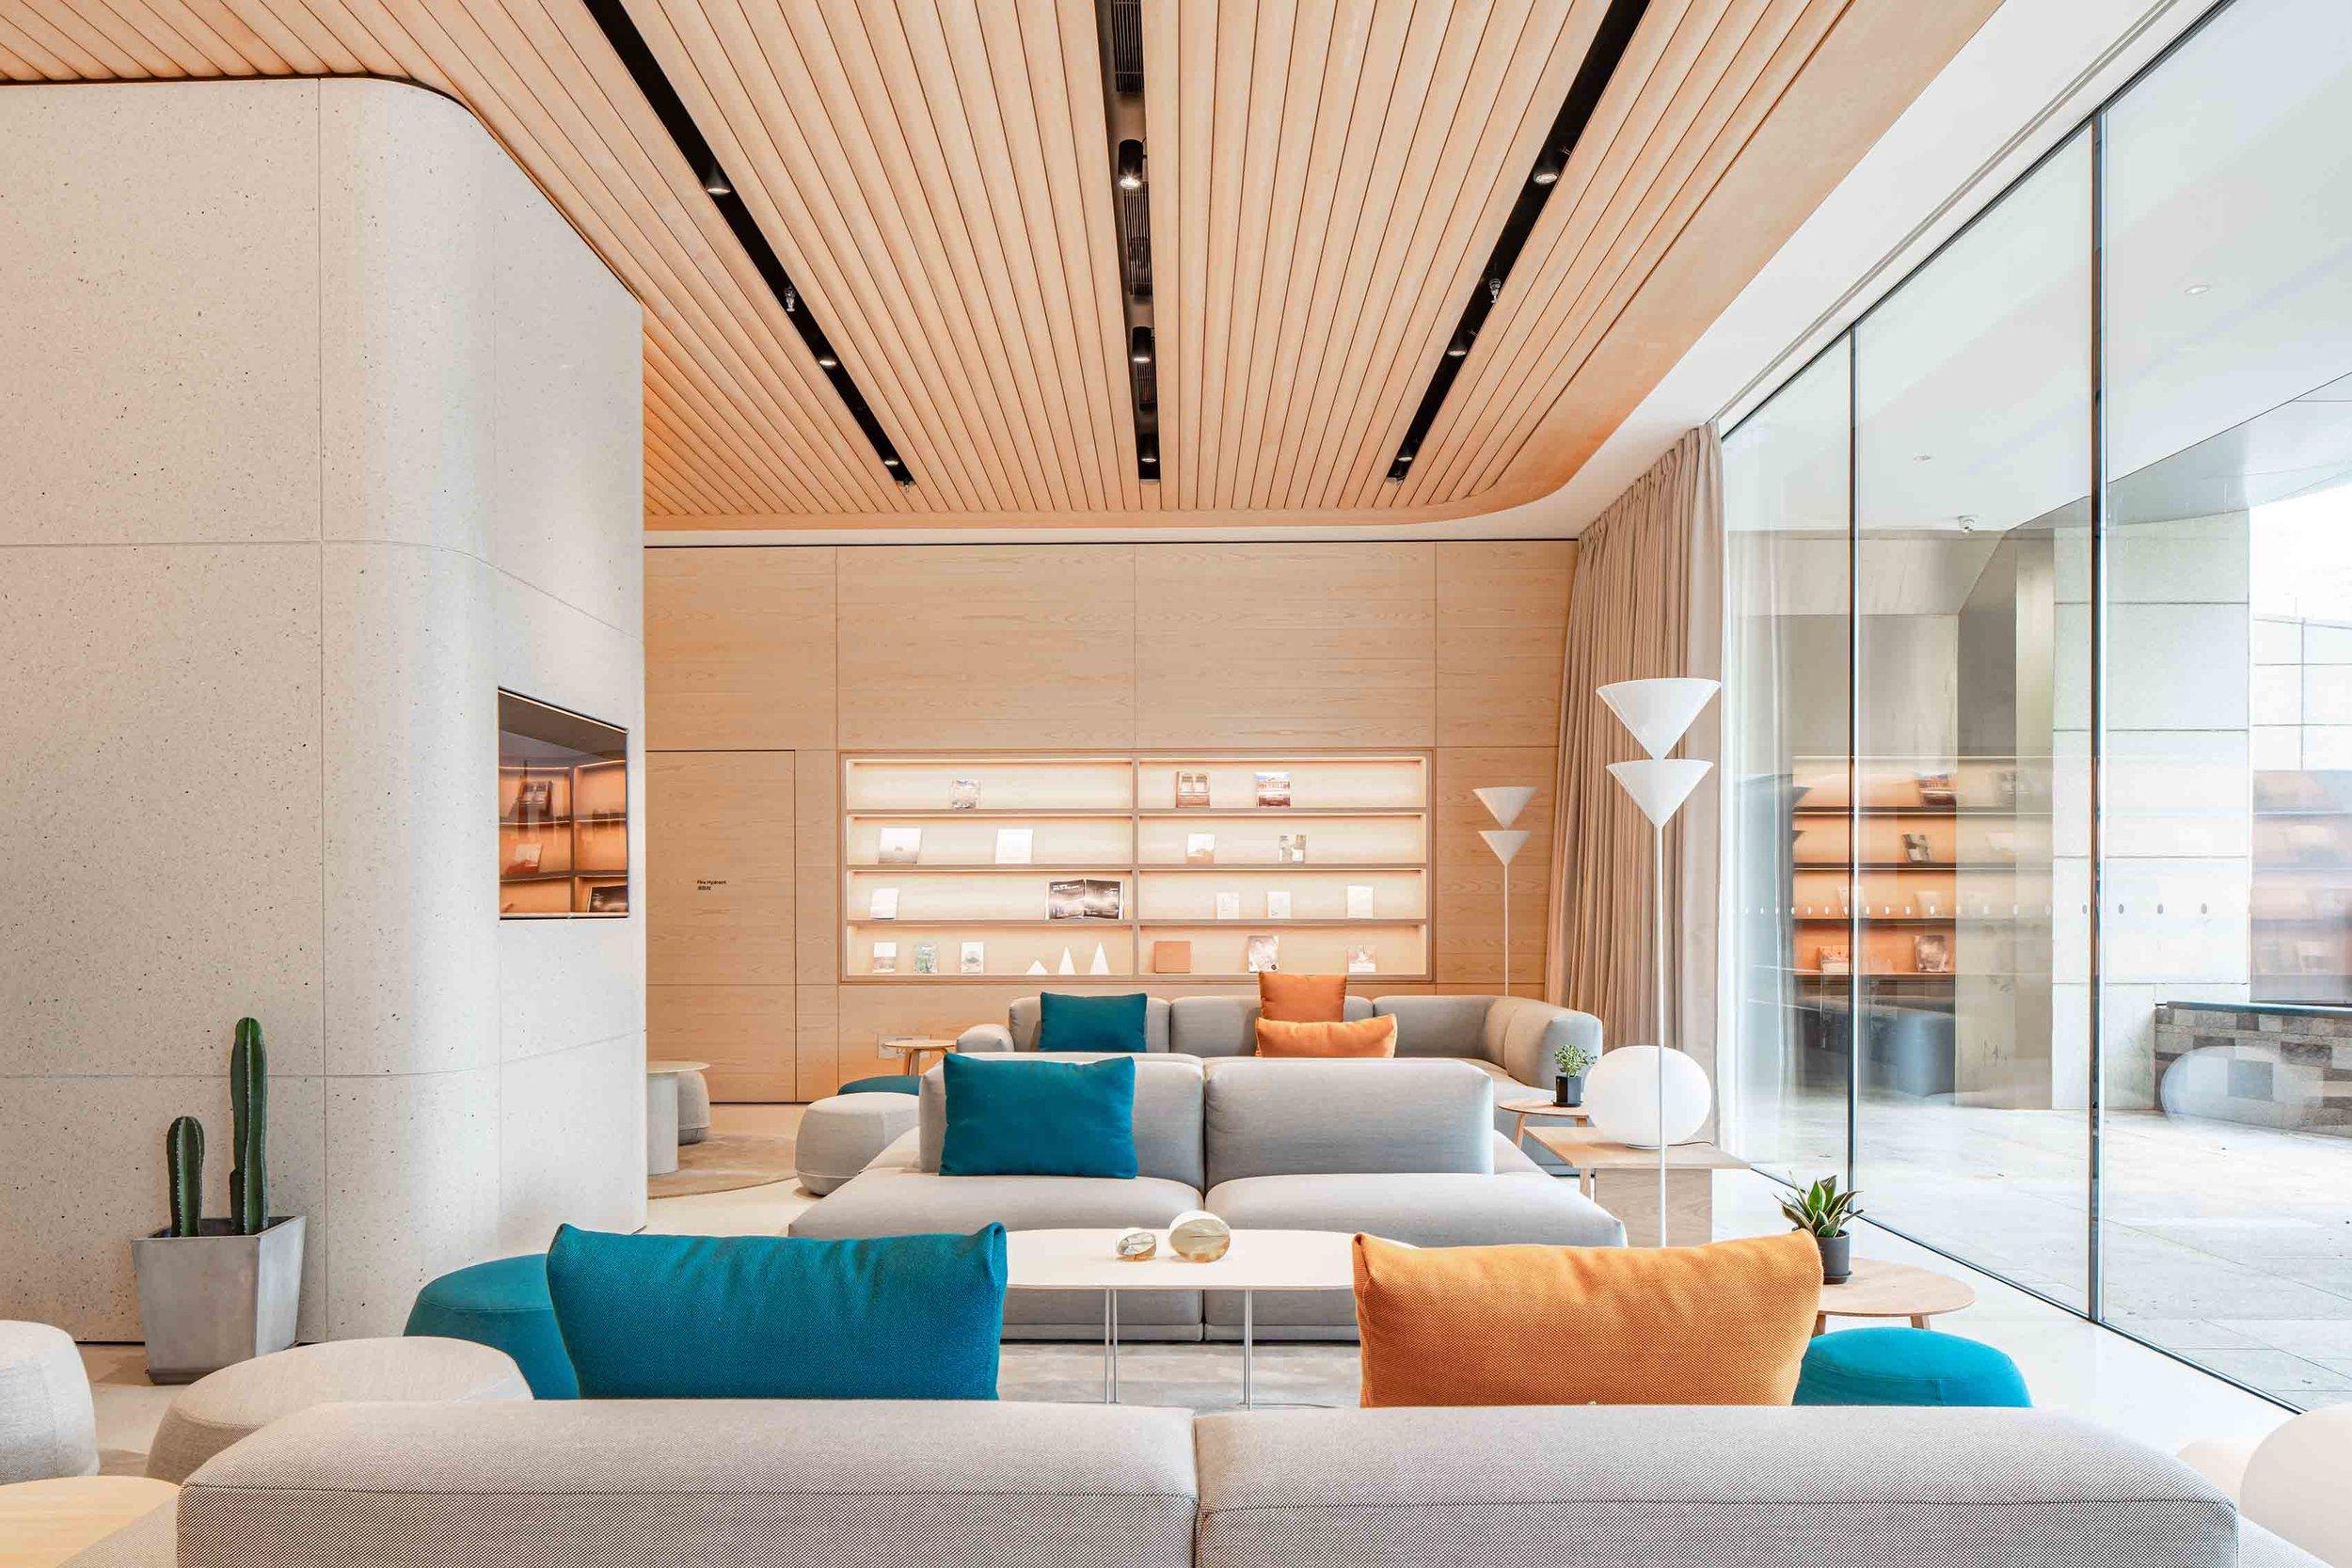 007 RAAMS Architecture Studio - NIO House Tianjin - China-Low.jpg